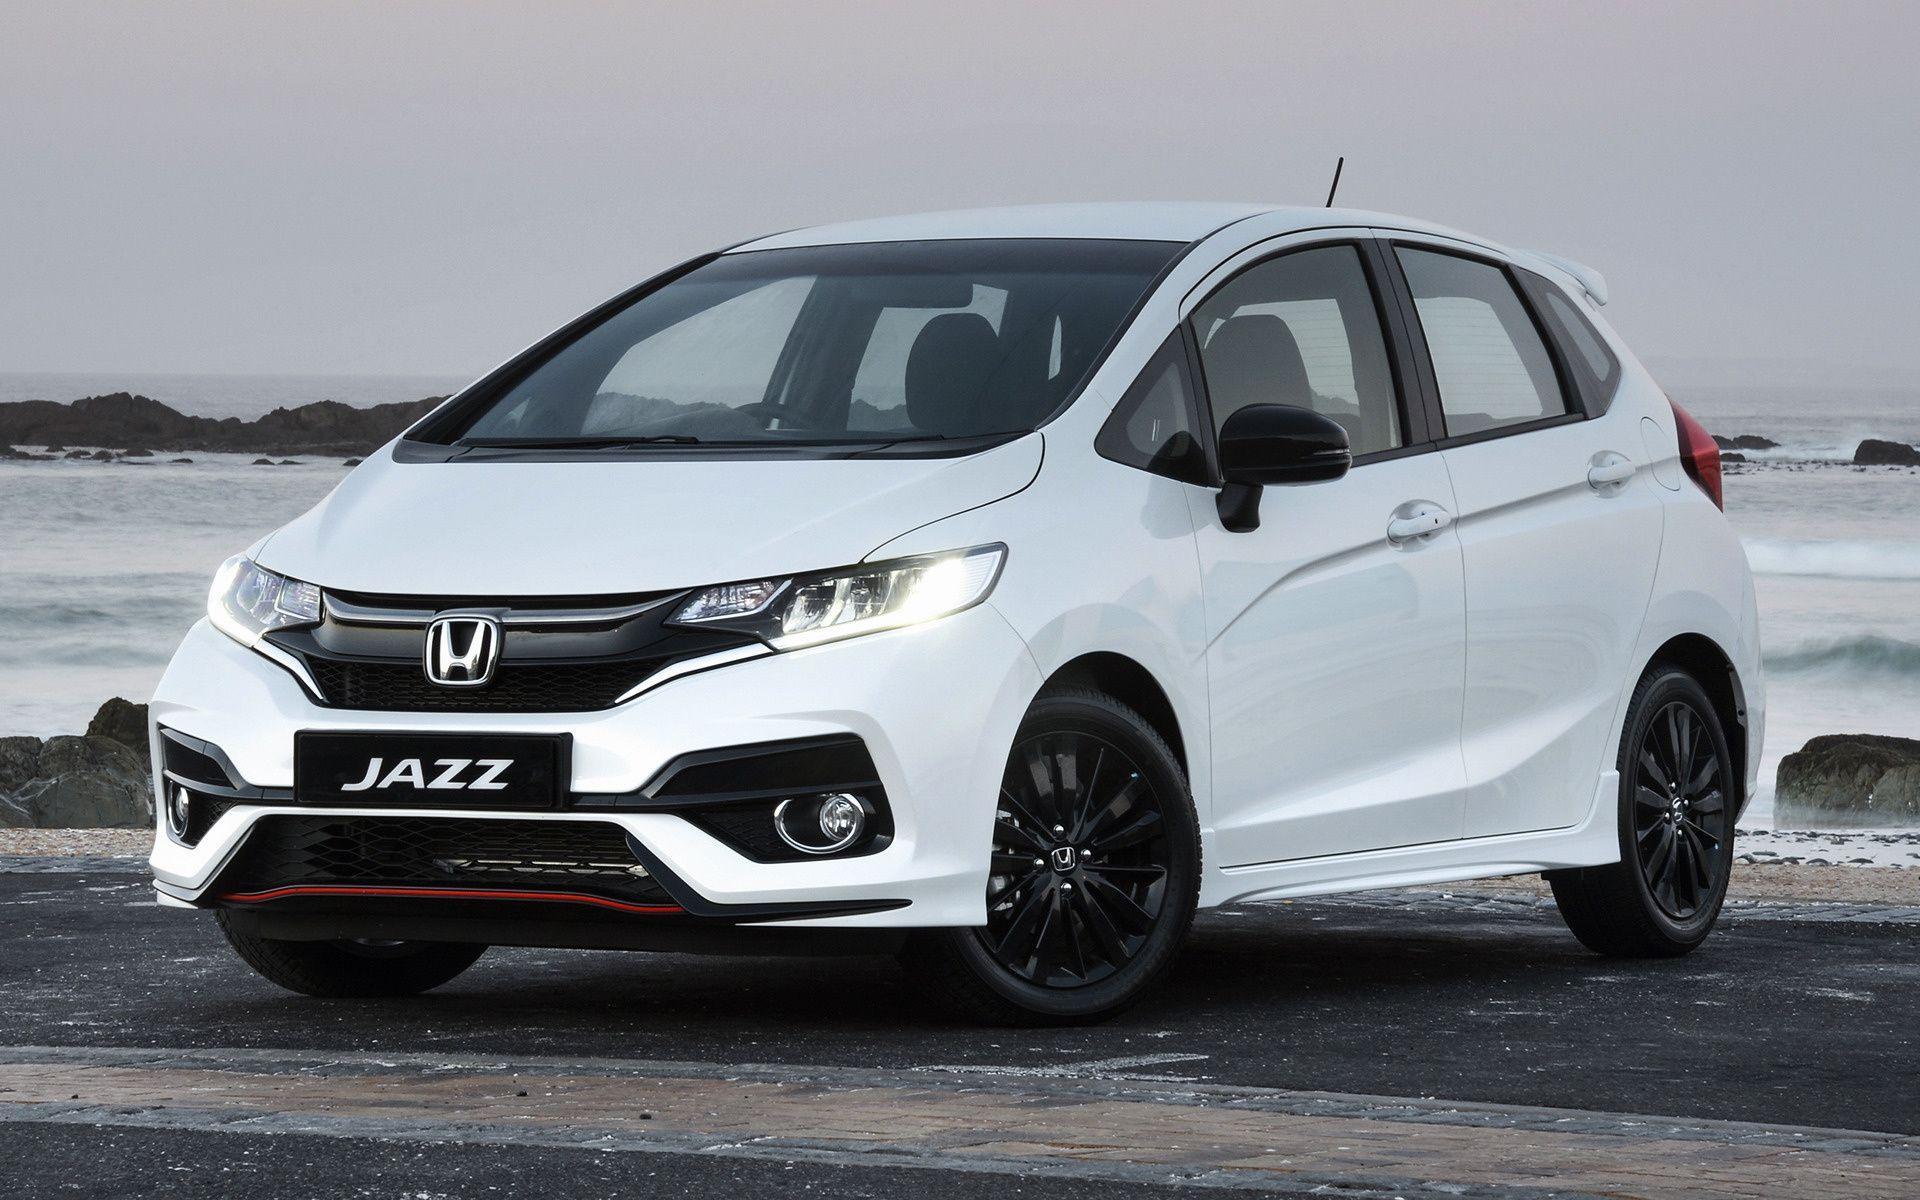 Kekurangan Mobil Jazz Rs Perbandingan Harga